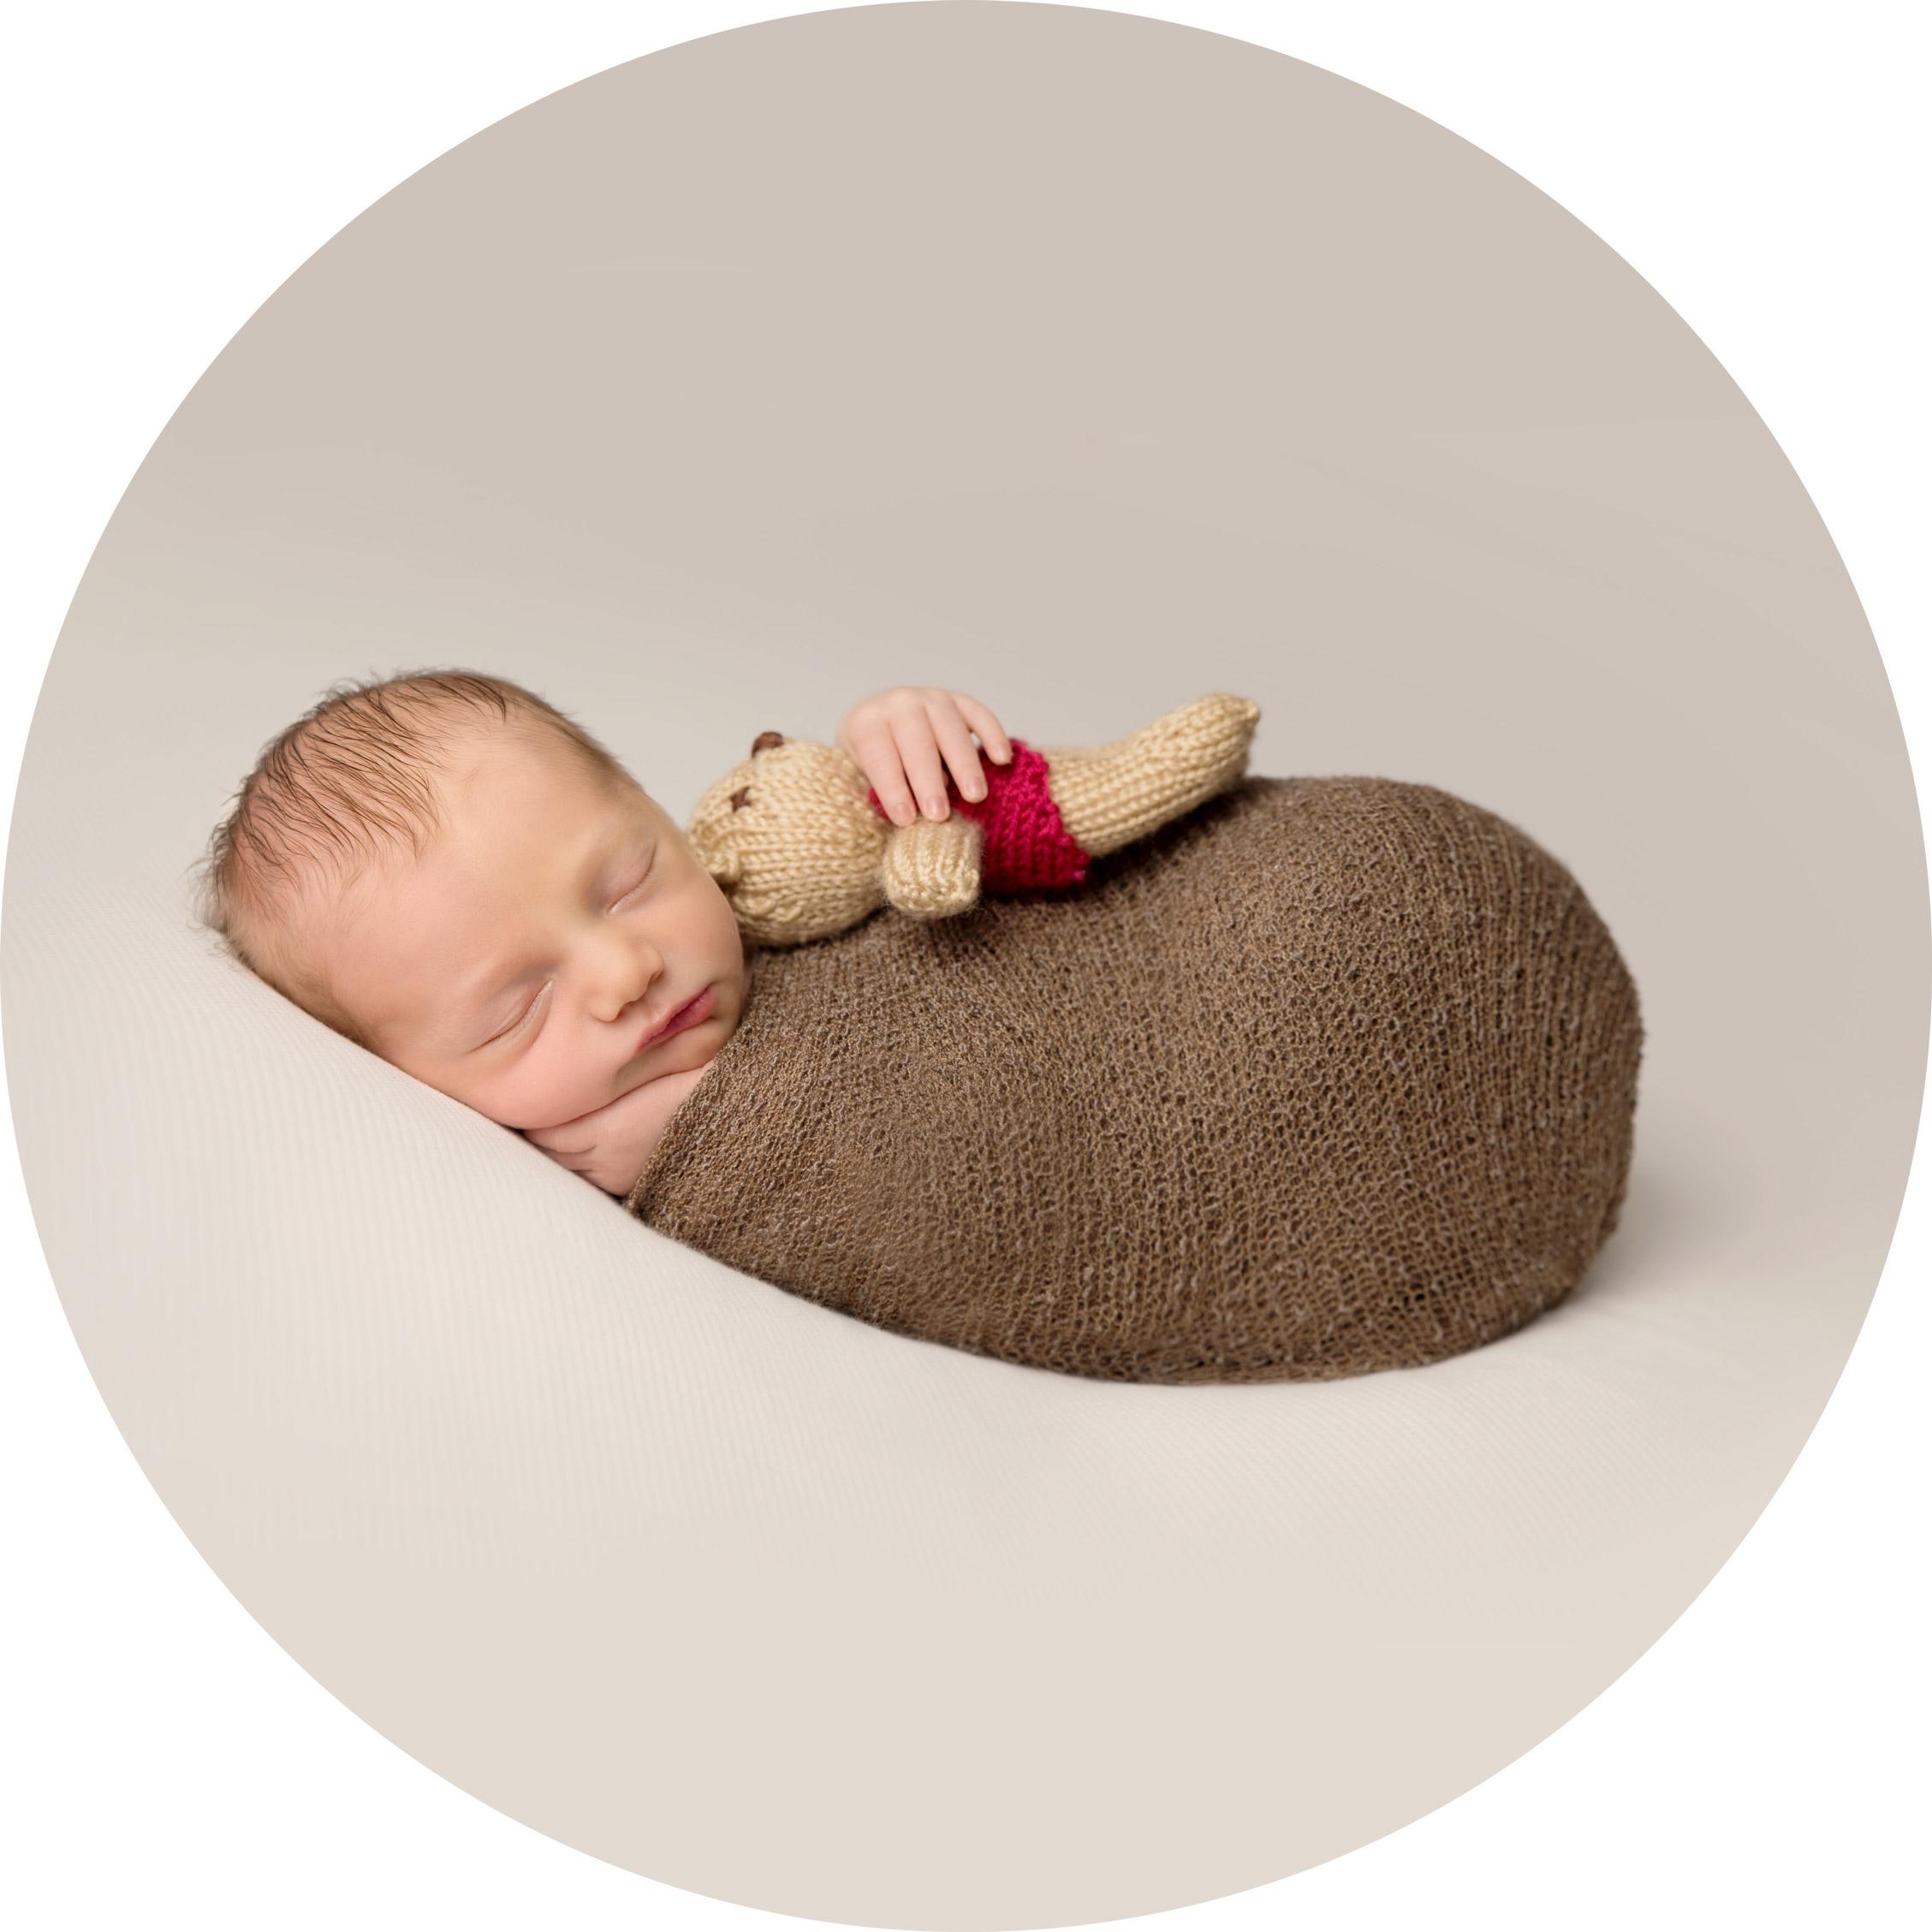 newborn-photography-hemel-hempstead-becki-williams-photography.jpg